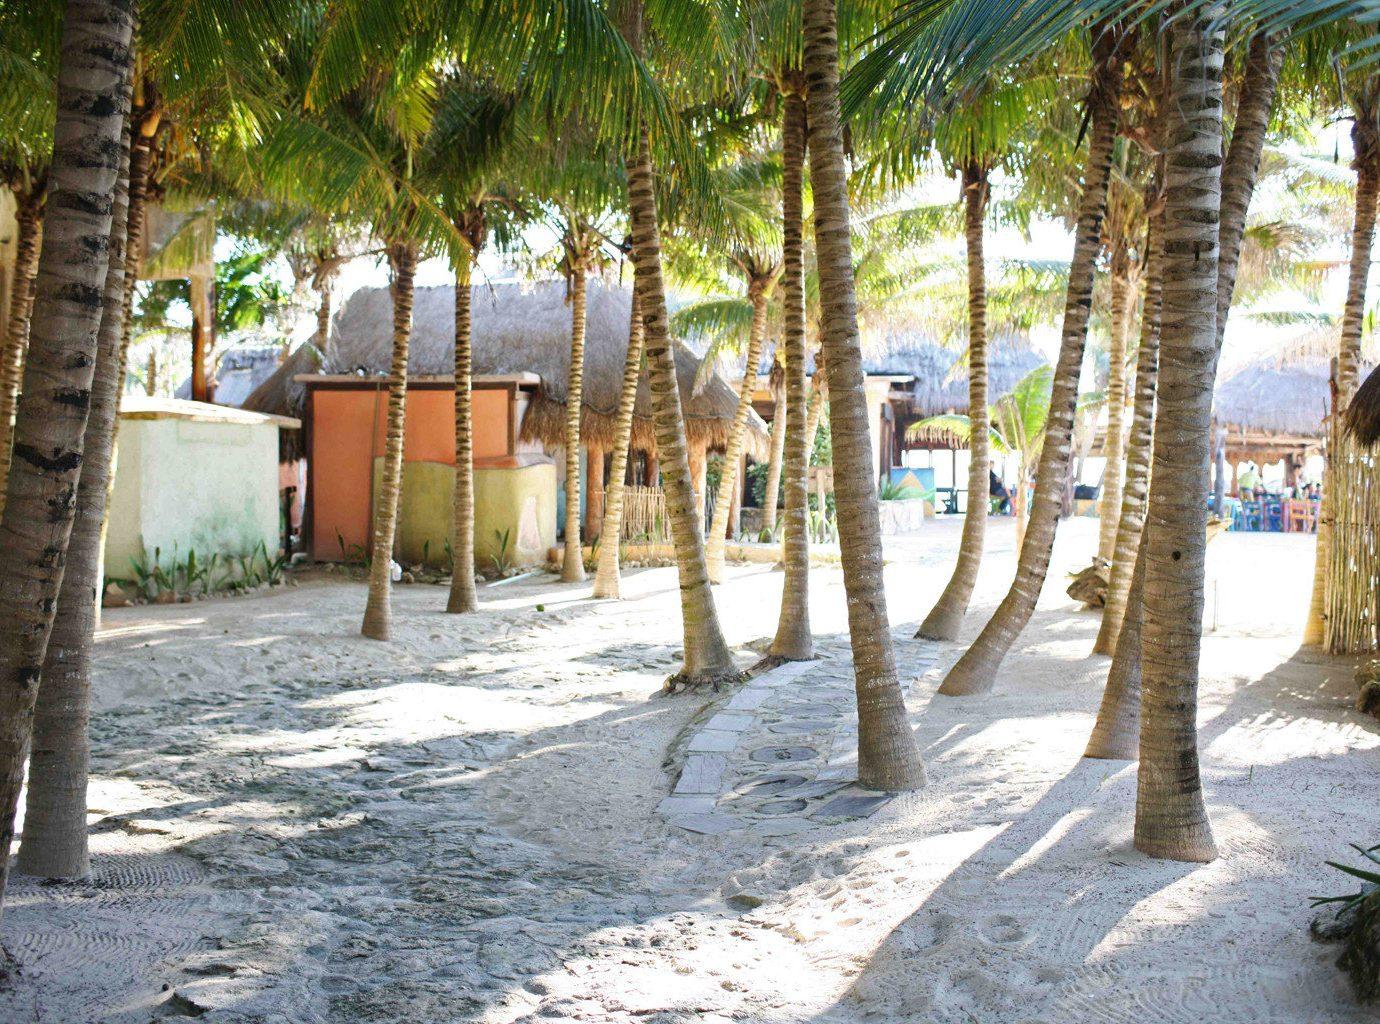 Beach Beachfront Grounds Island tree ground property plant Resort Village home shade